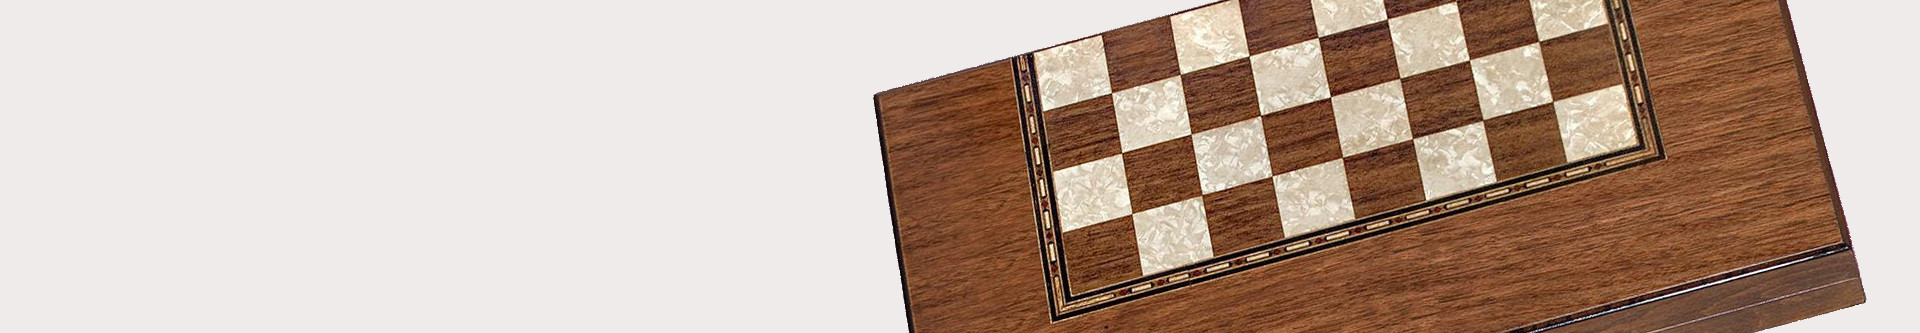 Шахматы-шашки-нарды 3 в 1